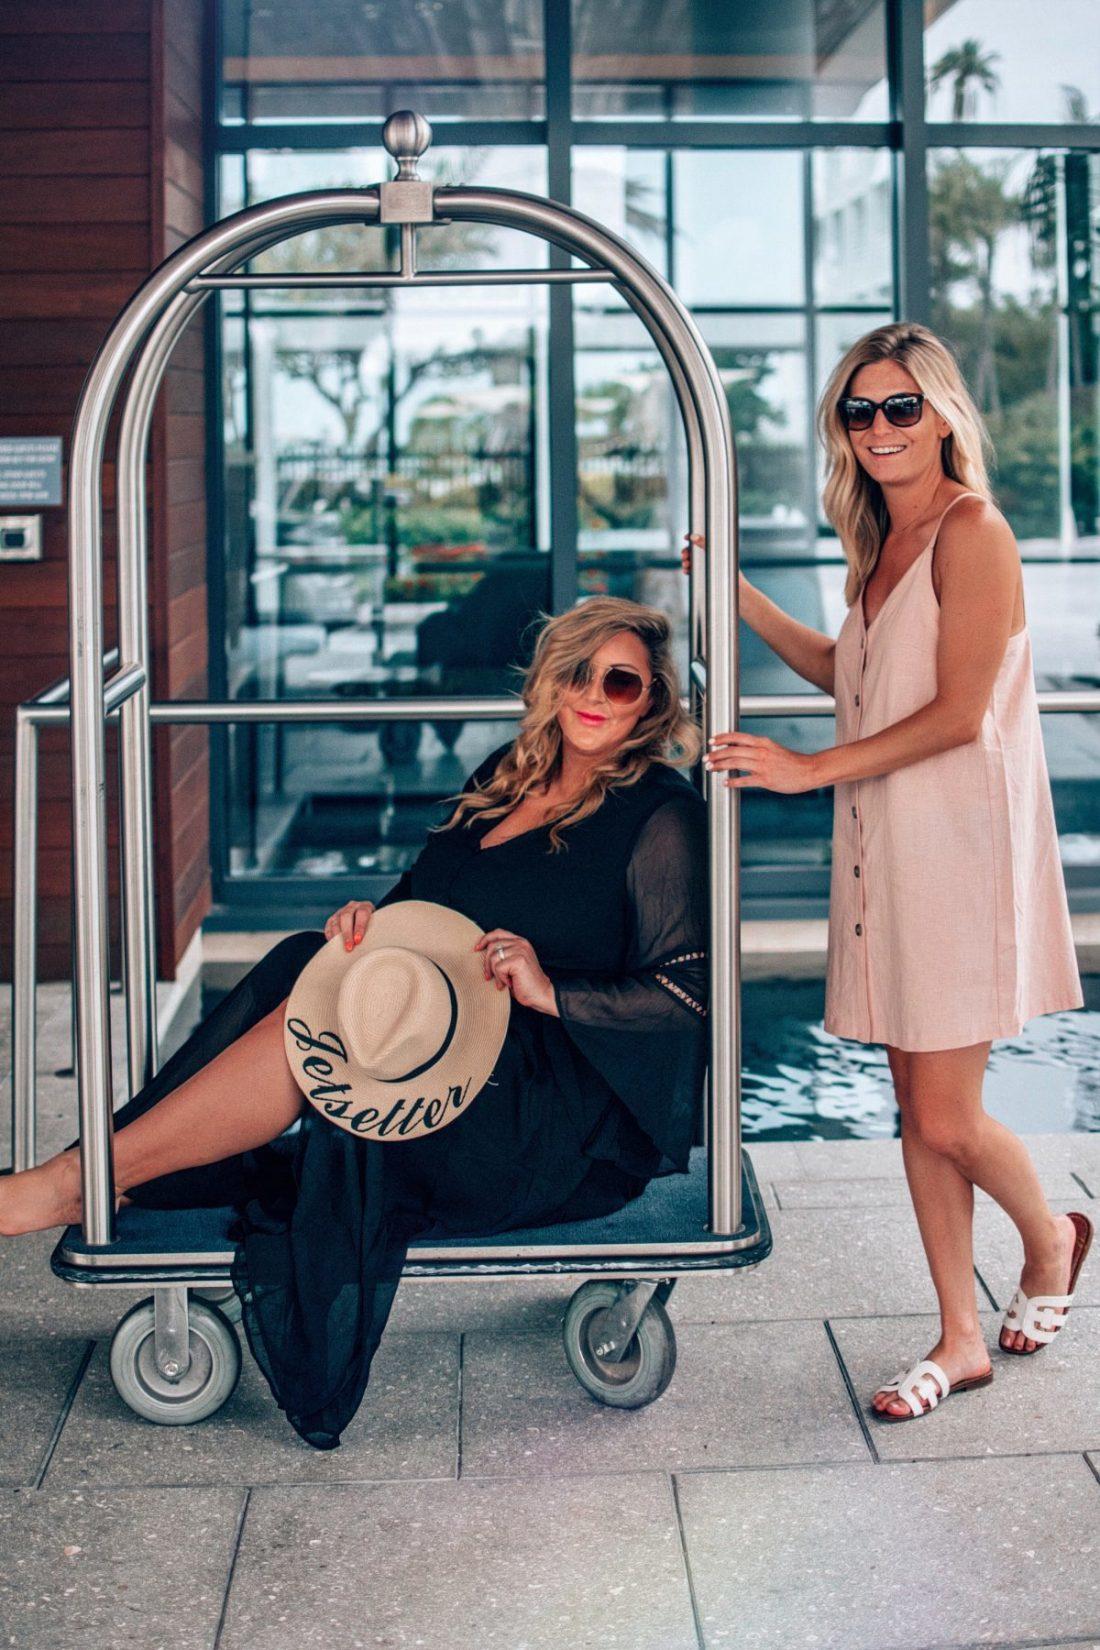 Verbal Gold Blog and One Small Blonde at Zota Beach Resort